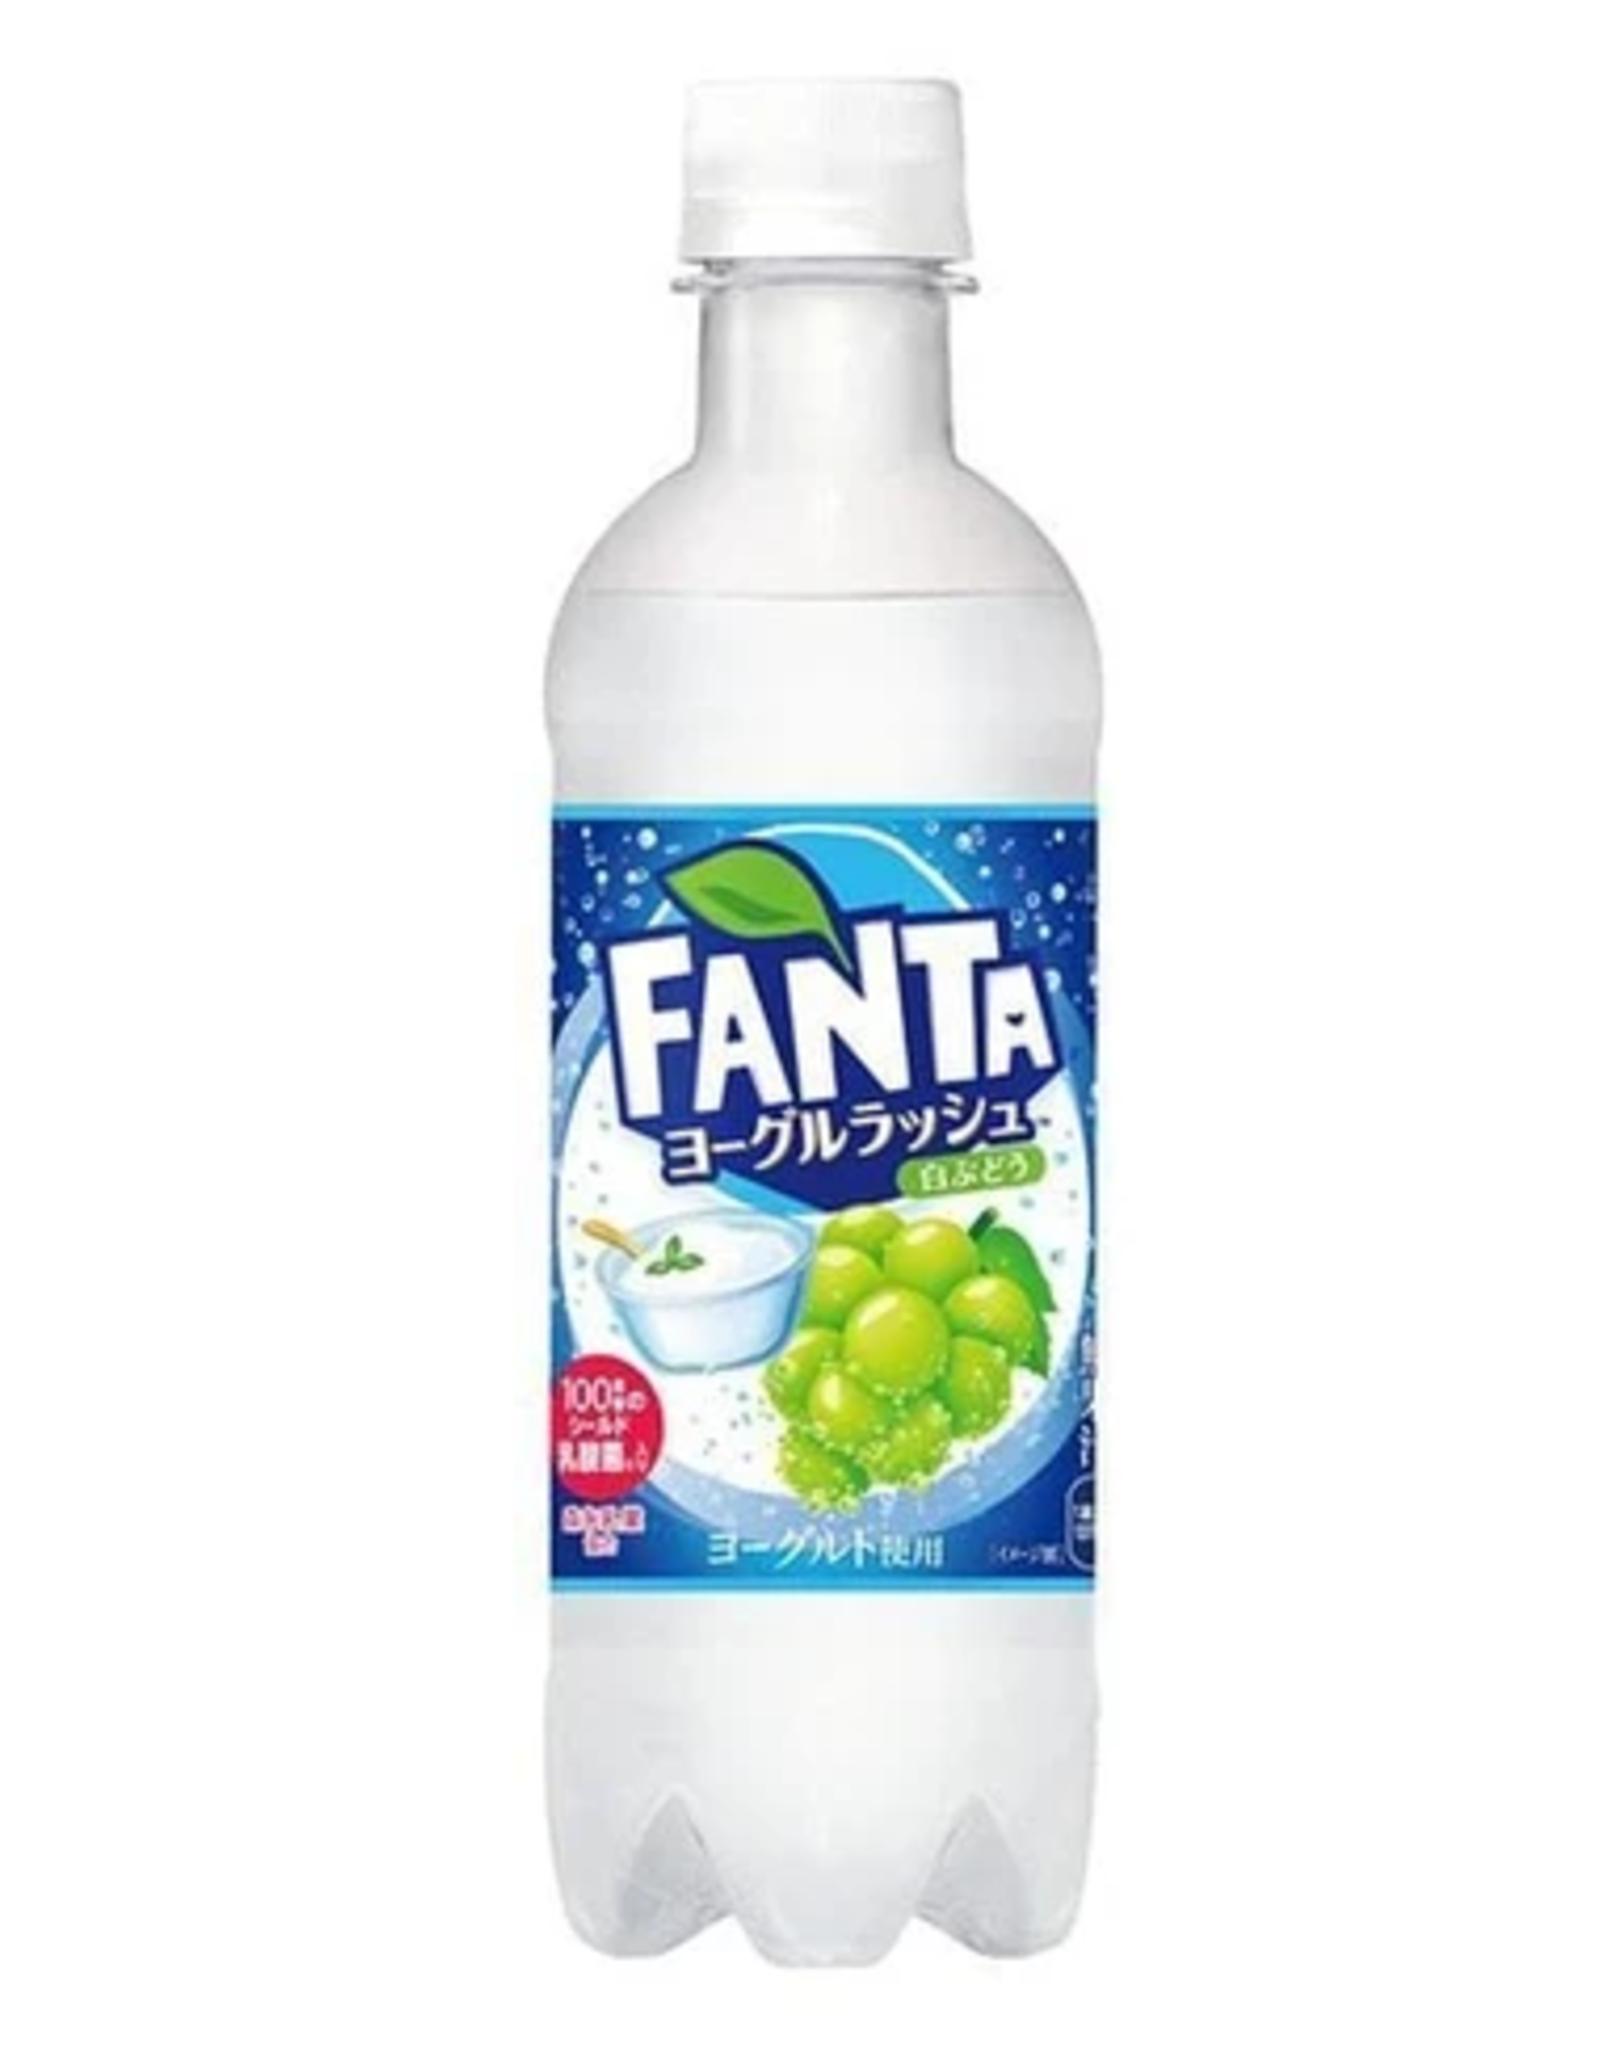 Fanta Yogurt Rush with White Grapes - Japan Exclusive - 380 ml